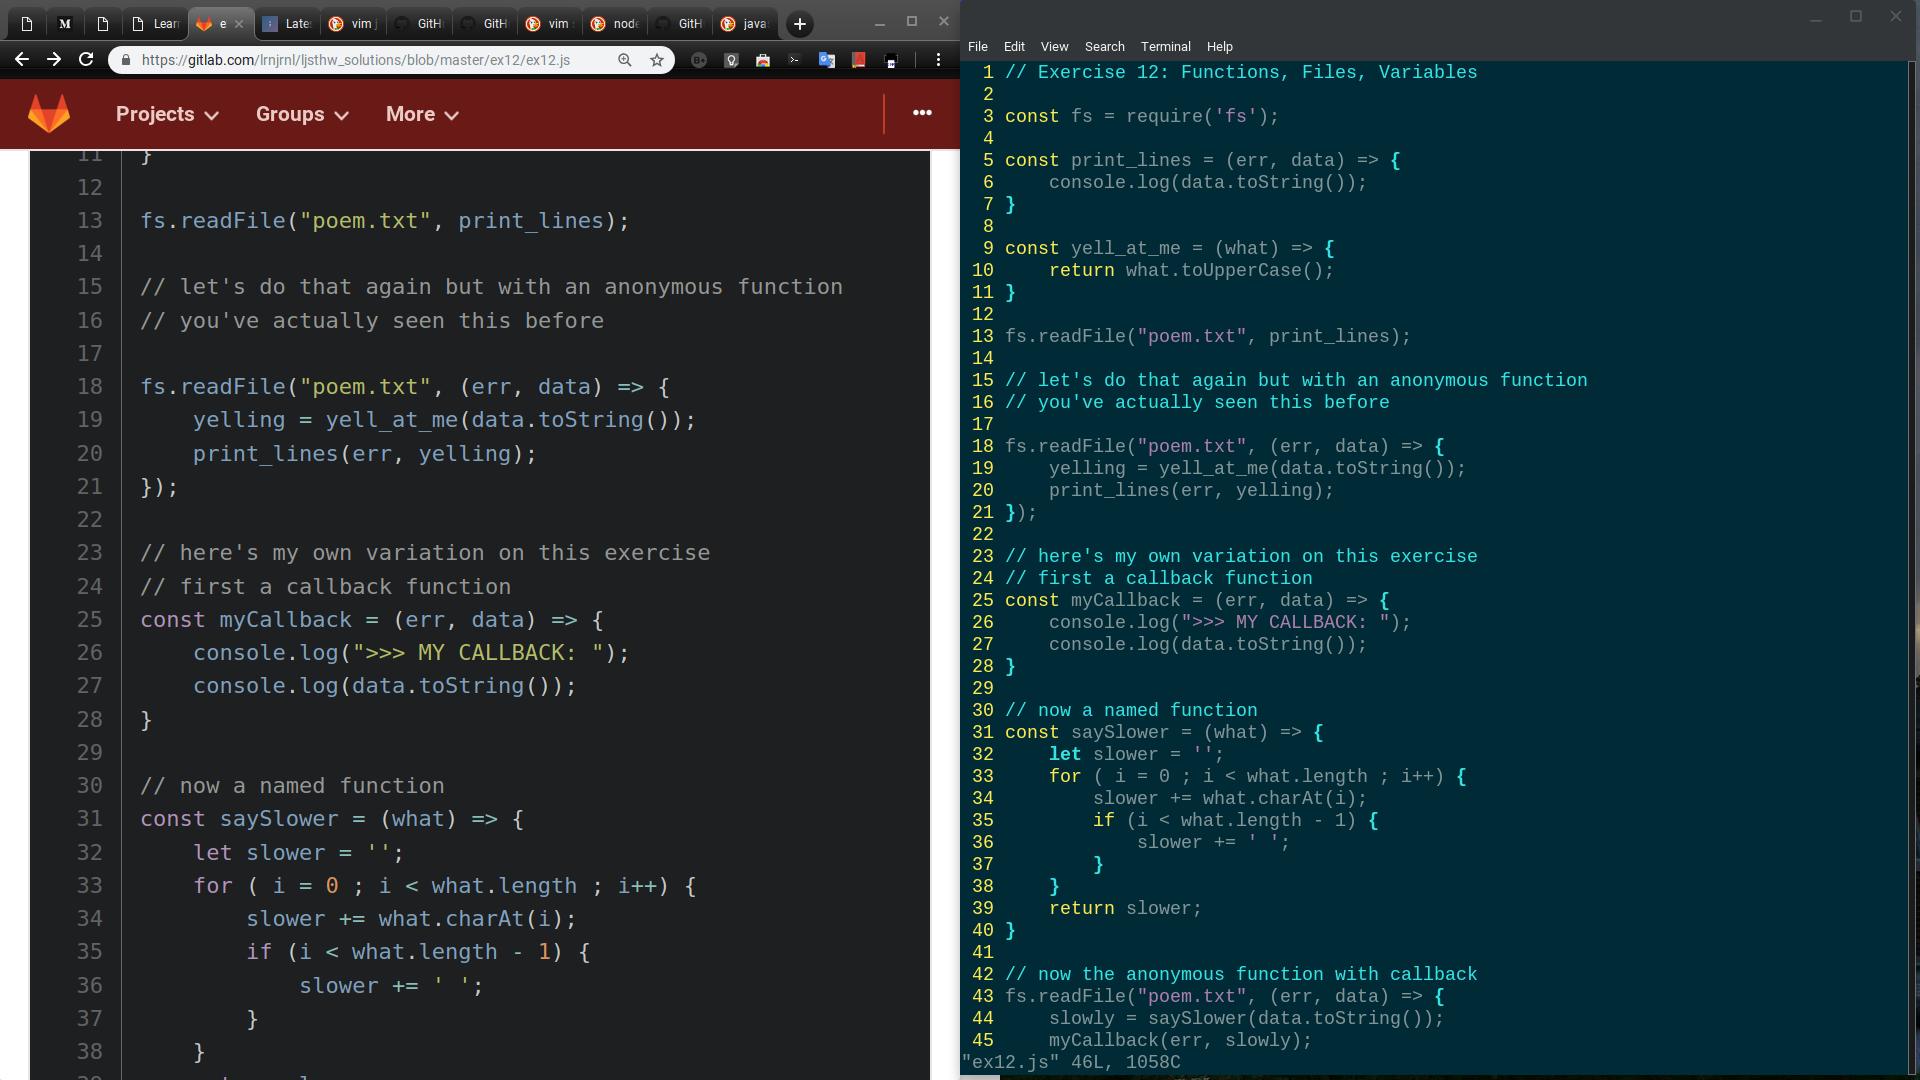 Syntax highlighting for JavaScript - Vim School - Learn Code Forum